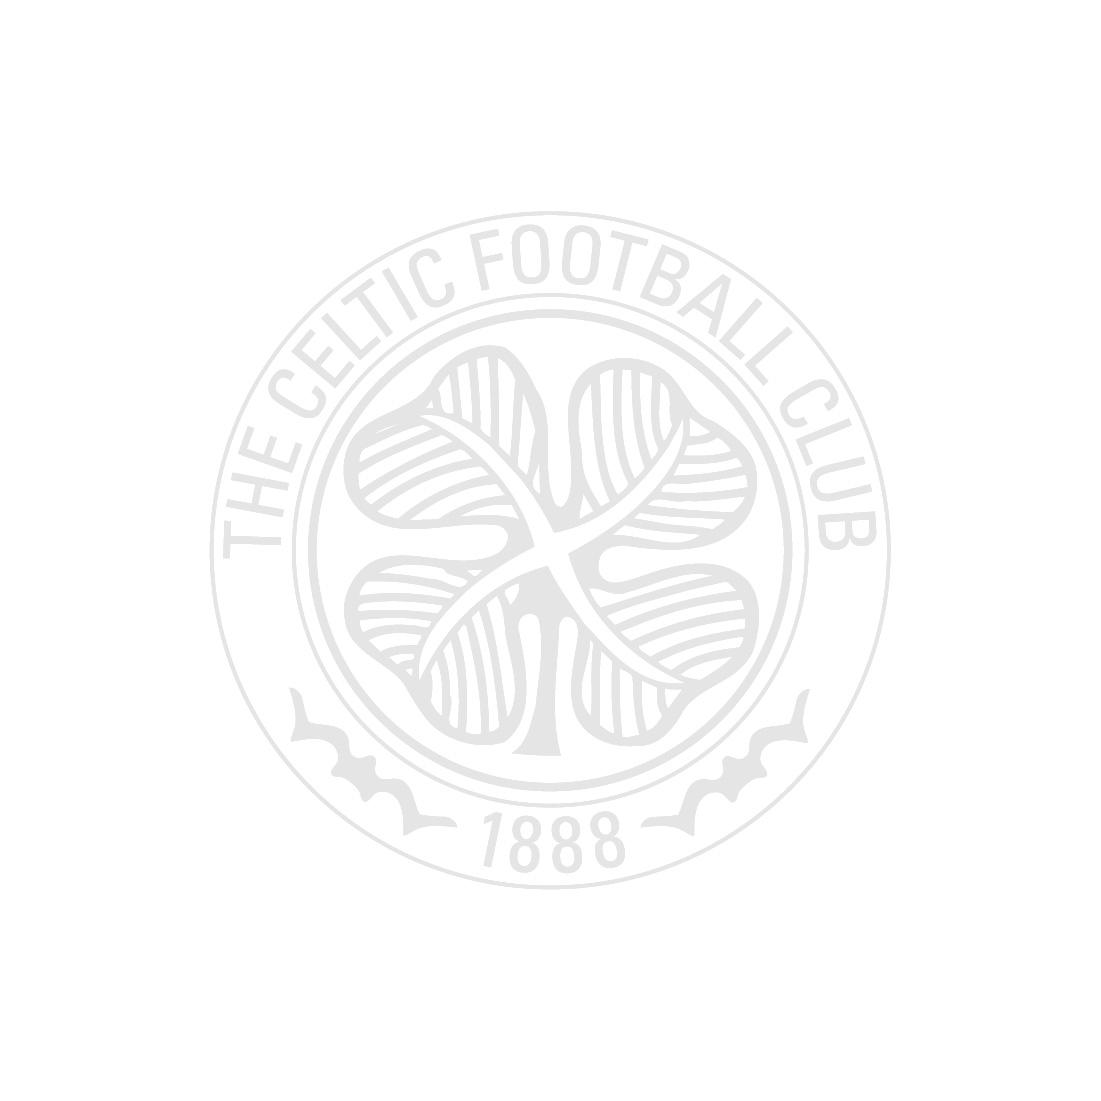 Celtic Mens Third Shirt 18/19 with Sponsor